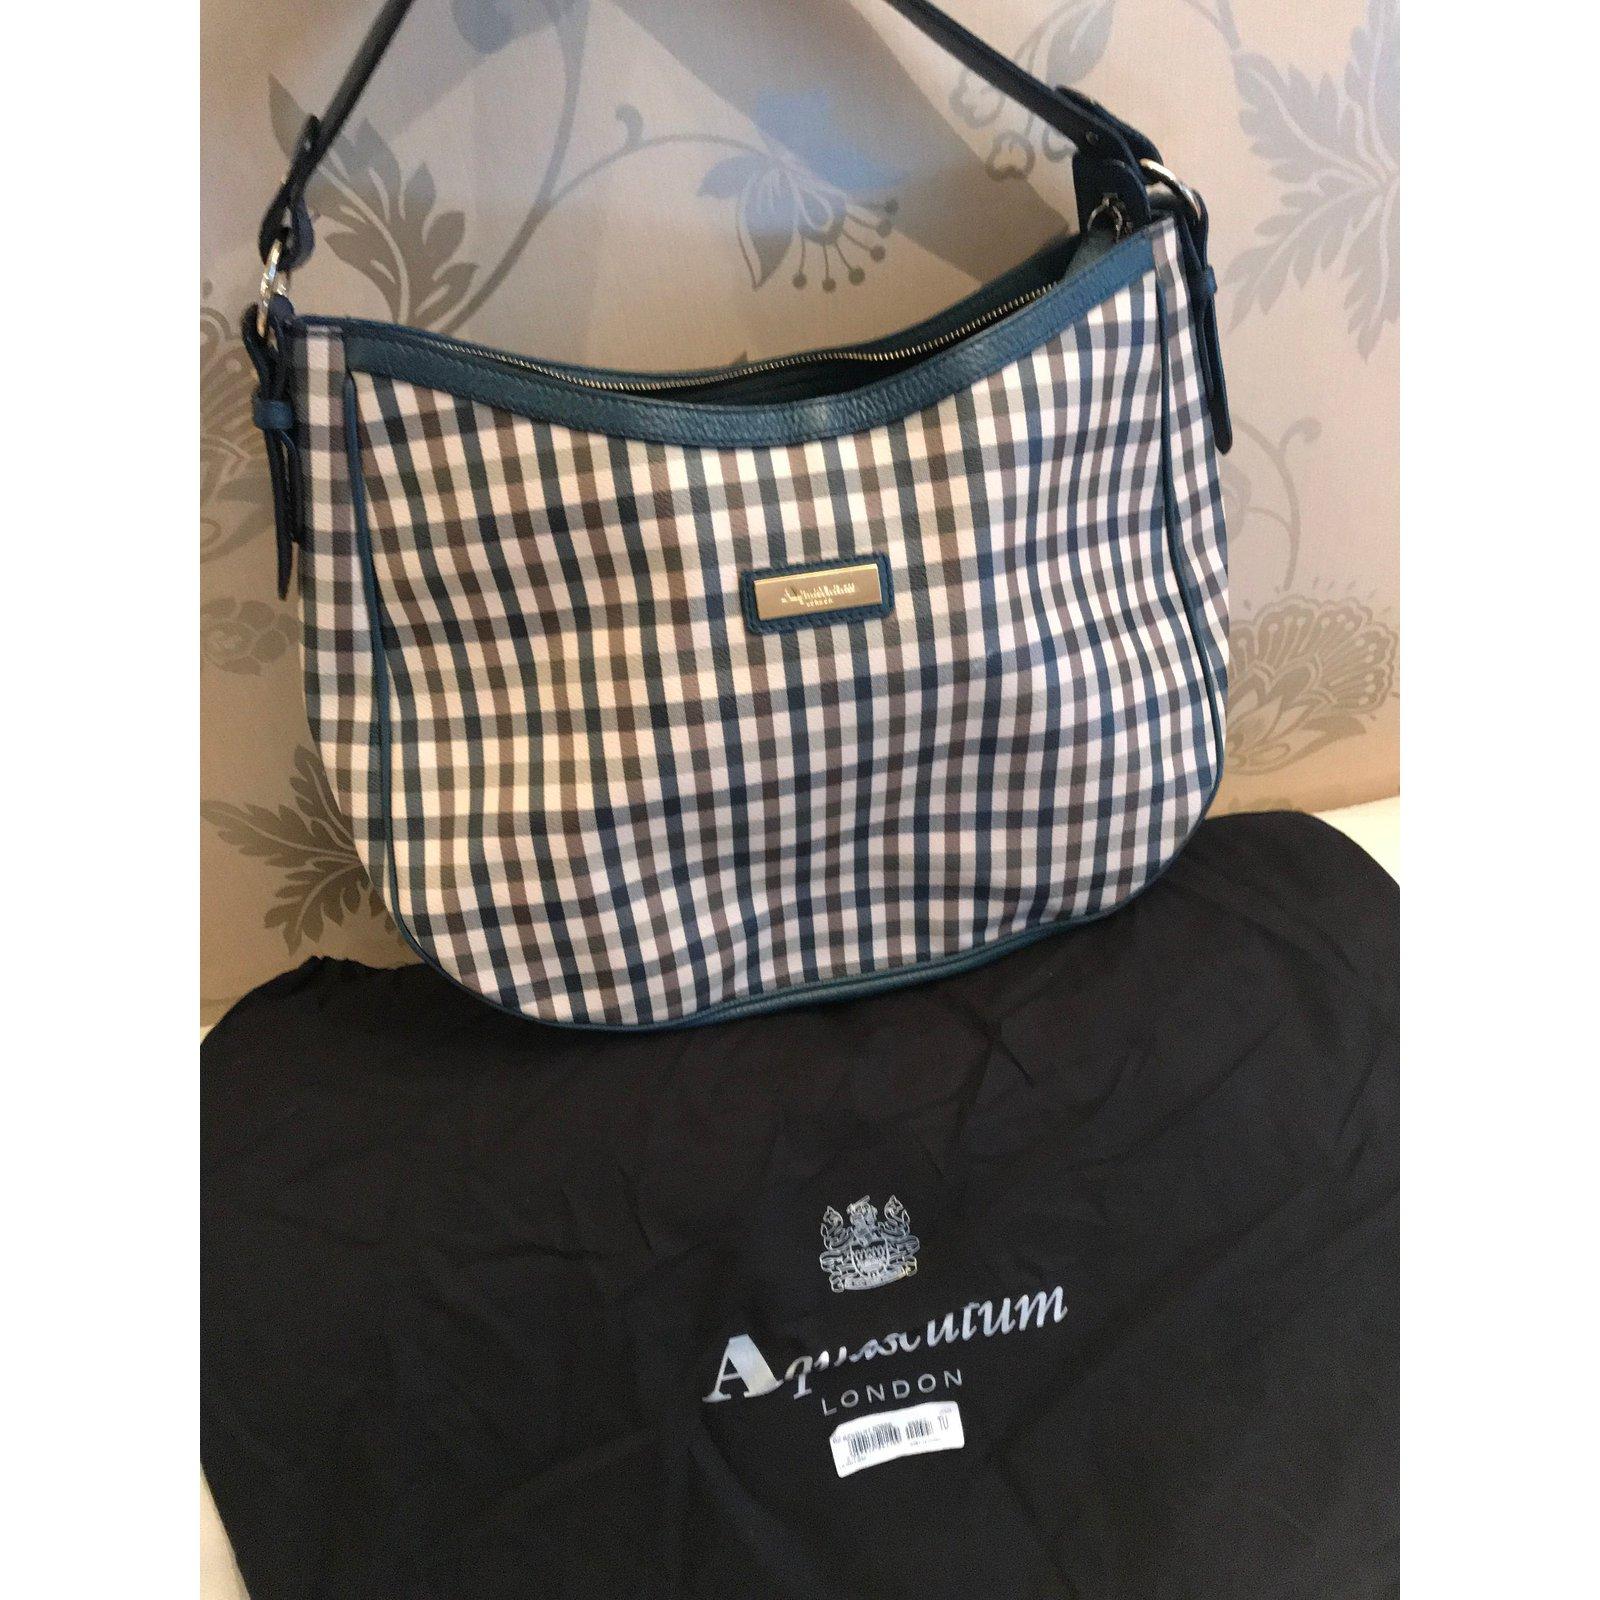 Aquascutum London Medium Handbag Hobo Limited Edition Handbags Leather Beige Ref 58385 Joli Closet